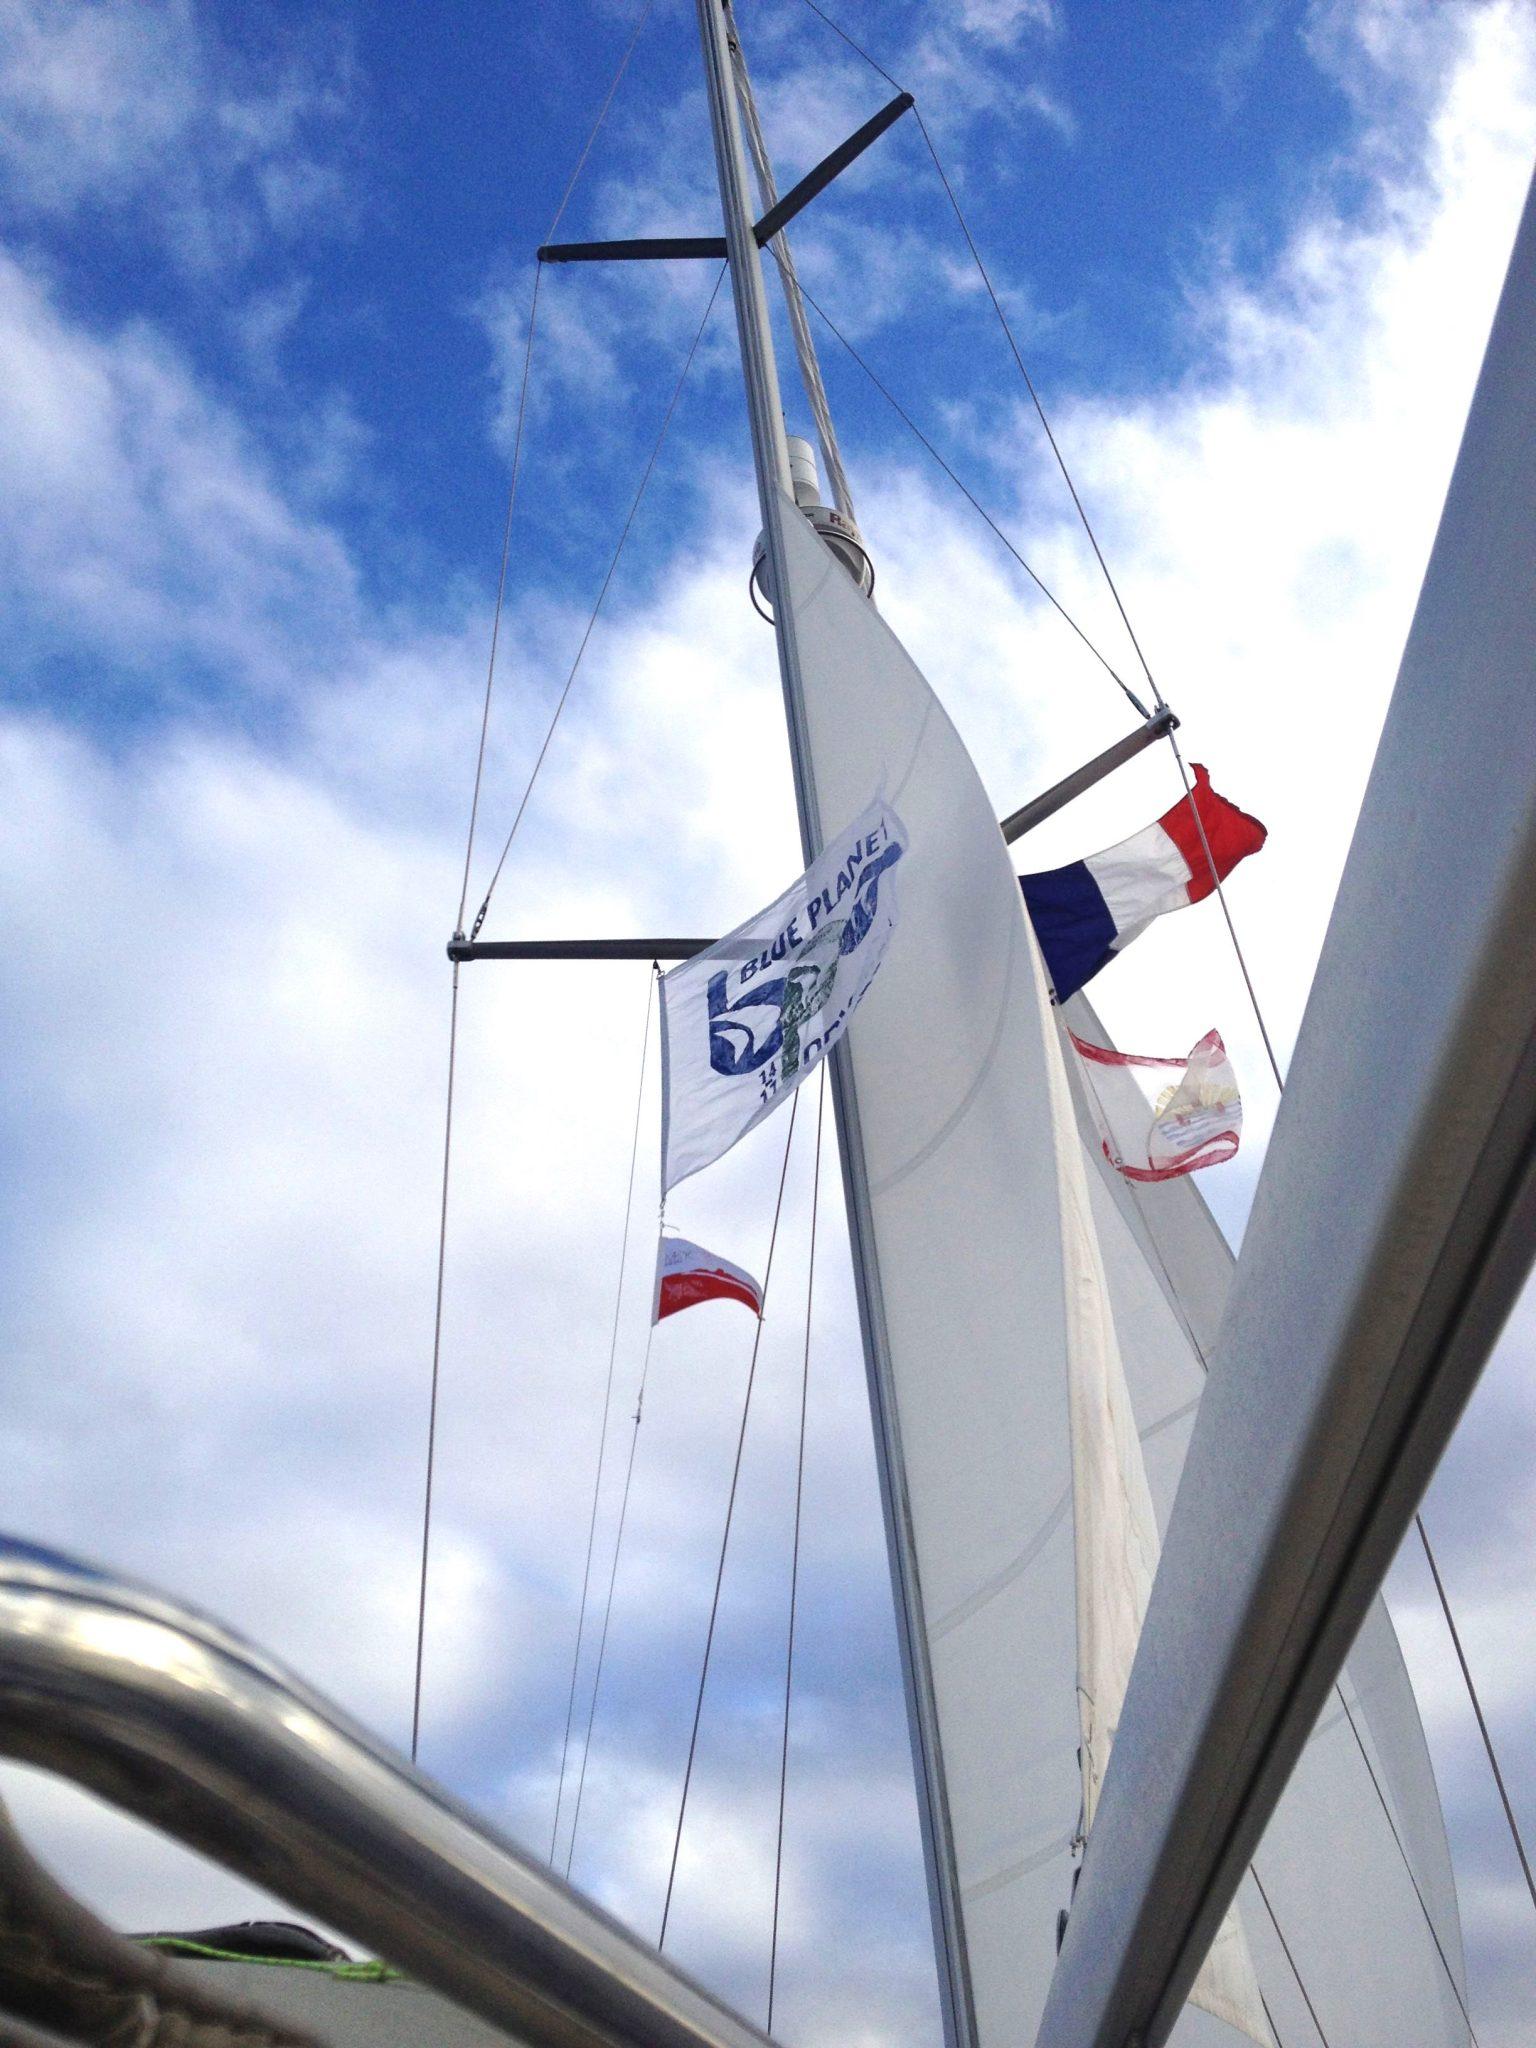 61. Joyful leaving Bora Bora flying the MaiKai Yacht Club Pennant, Blue Planet Odyssey flag, French Polynesia courtesy flag, and the French courtesy flag from her spreader halyards